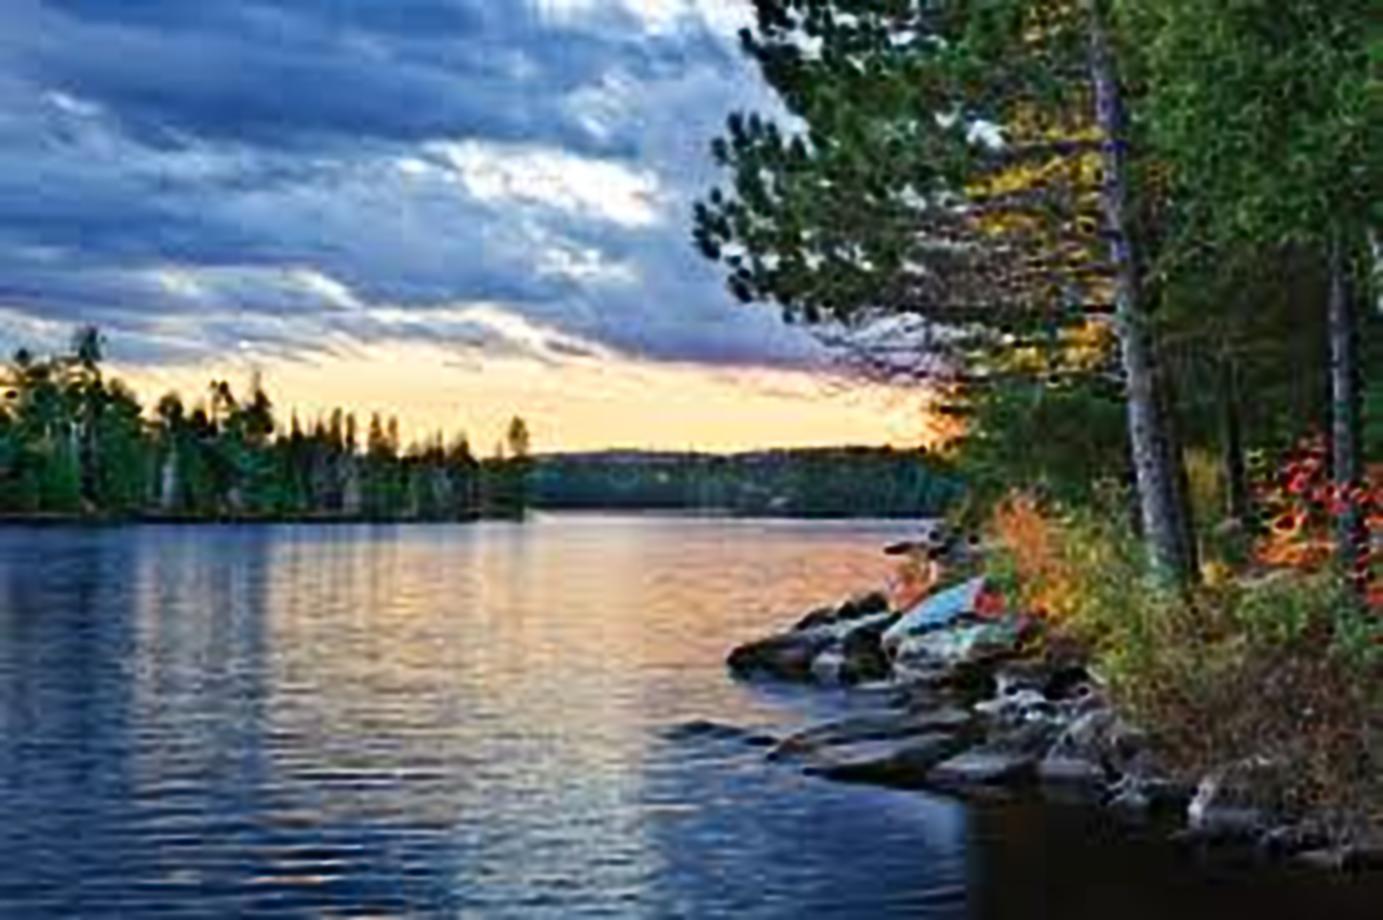 Affordable Off-grid Lakefront Property / Lots for Sale, Timiskaming